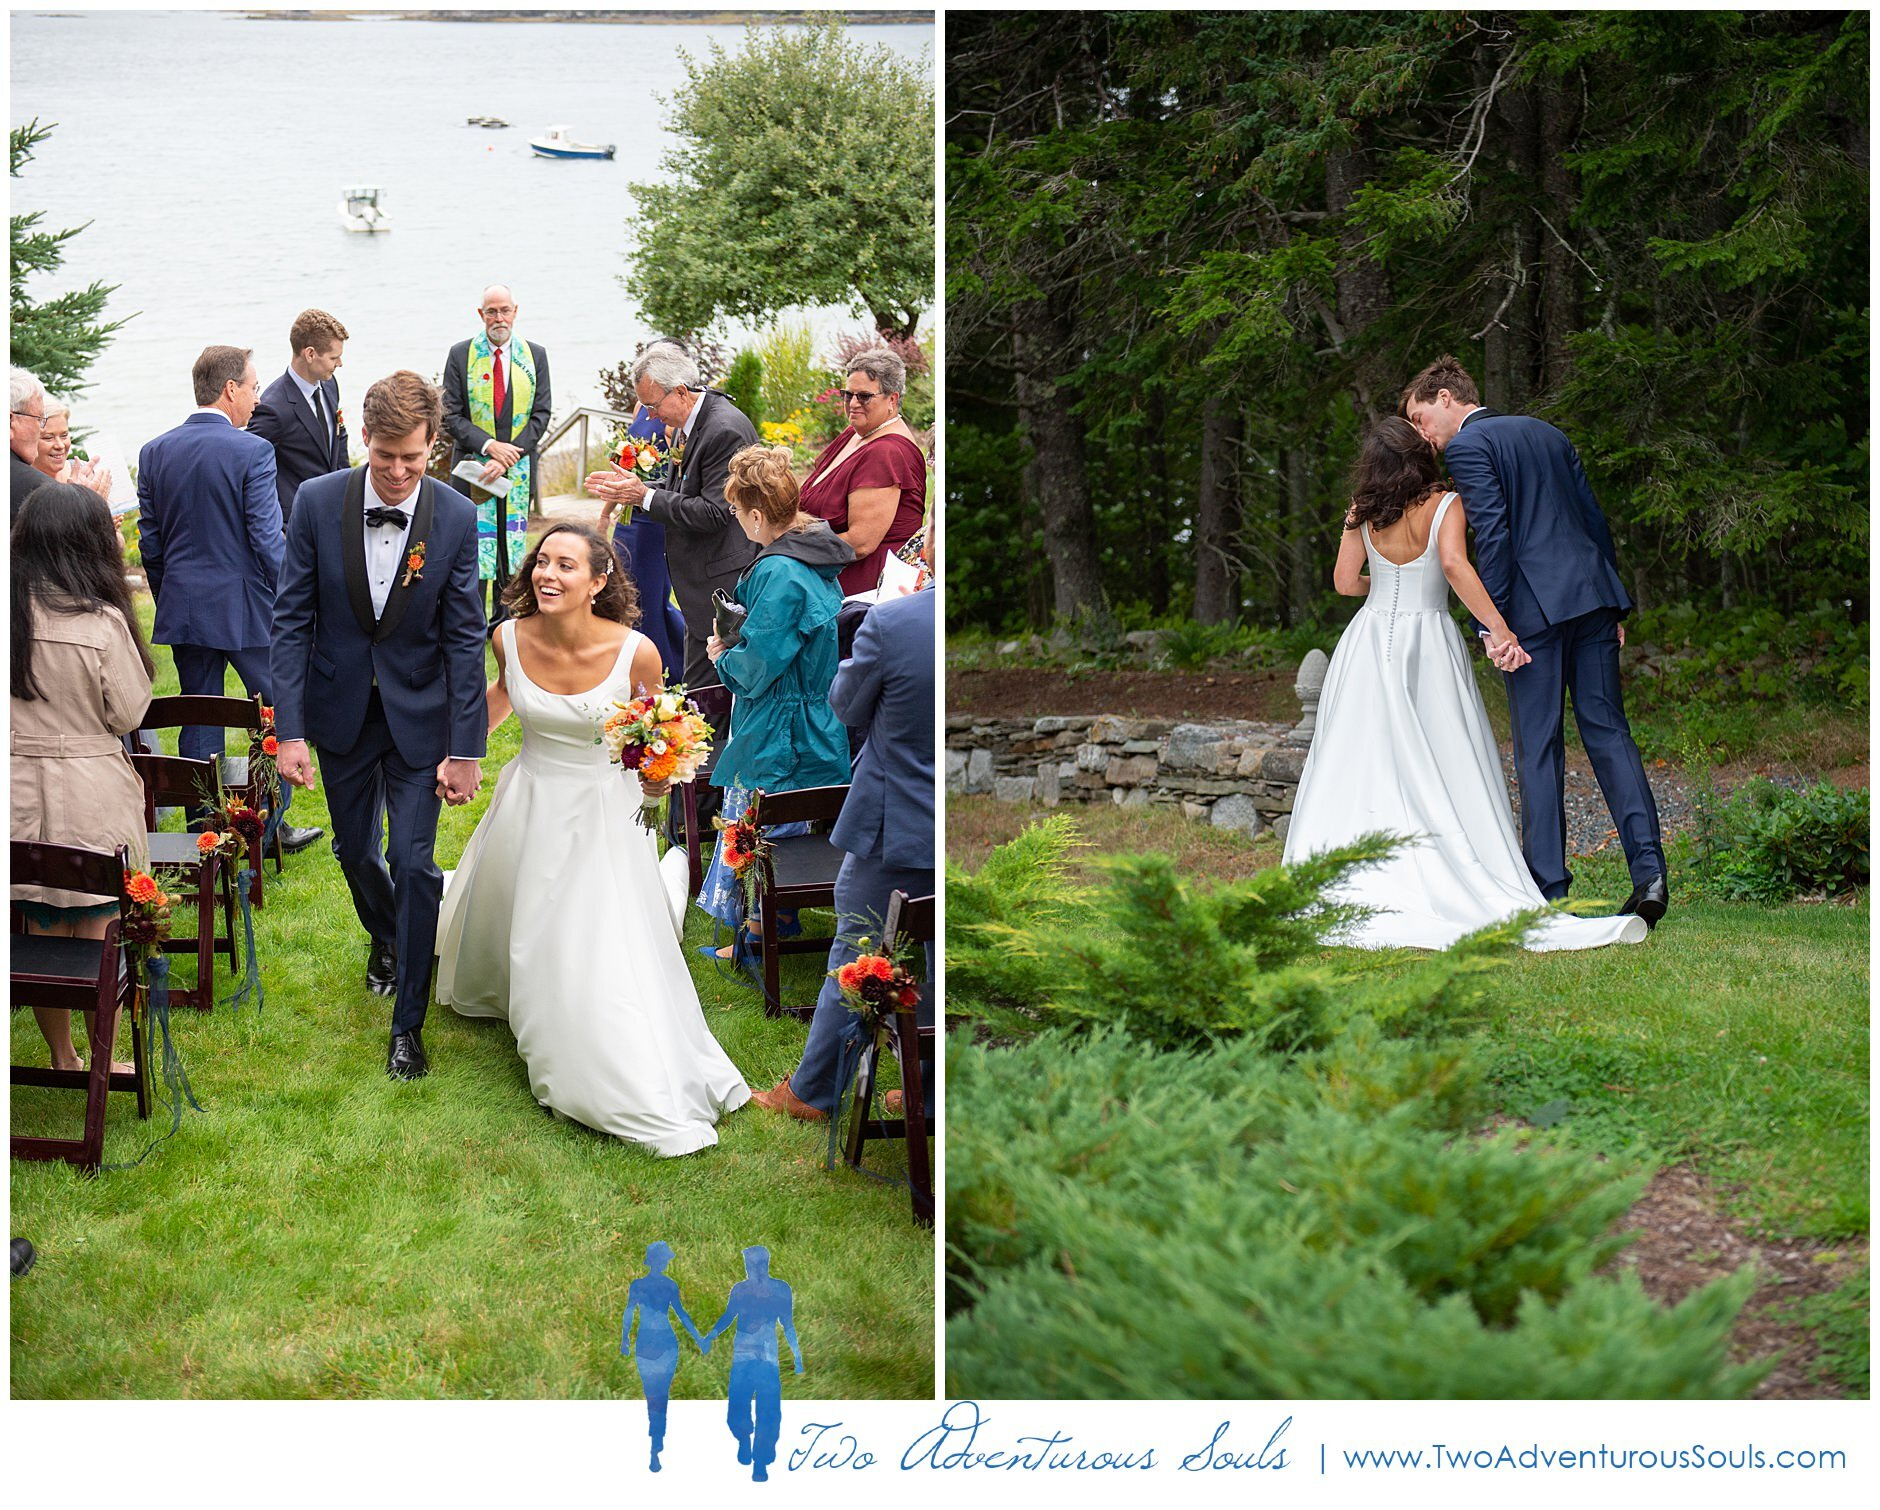 Bar Harbor Wedding Photographers, Acadia Bay Inn Wedding Photographers, Two Adventurous Souls- 091419_0025.jpg